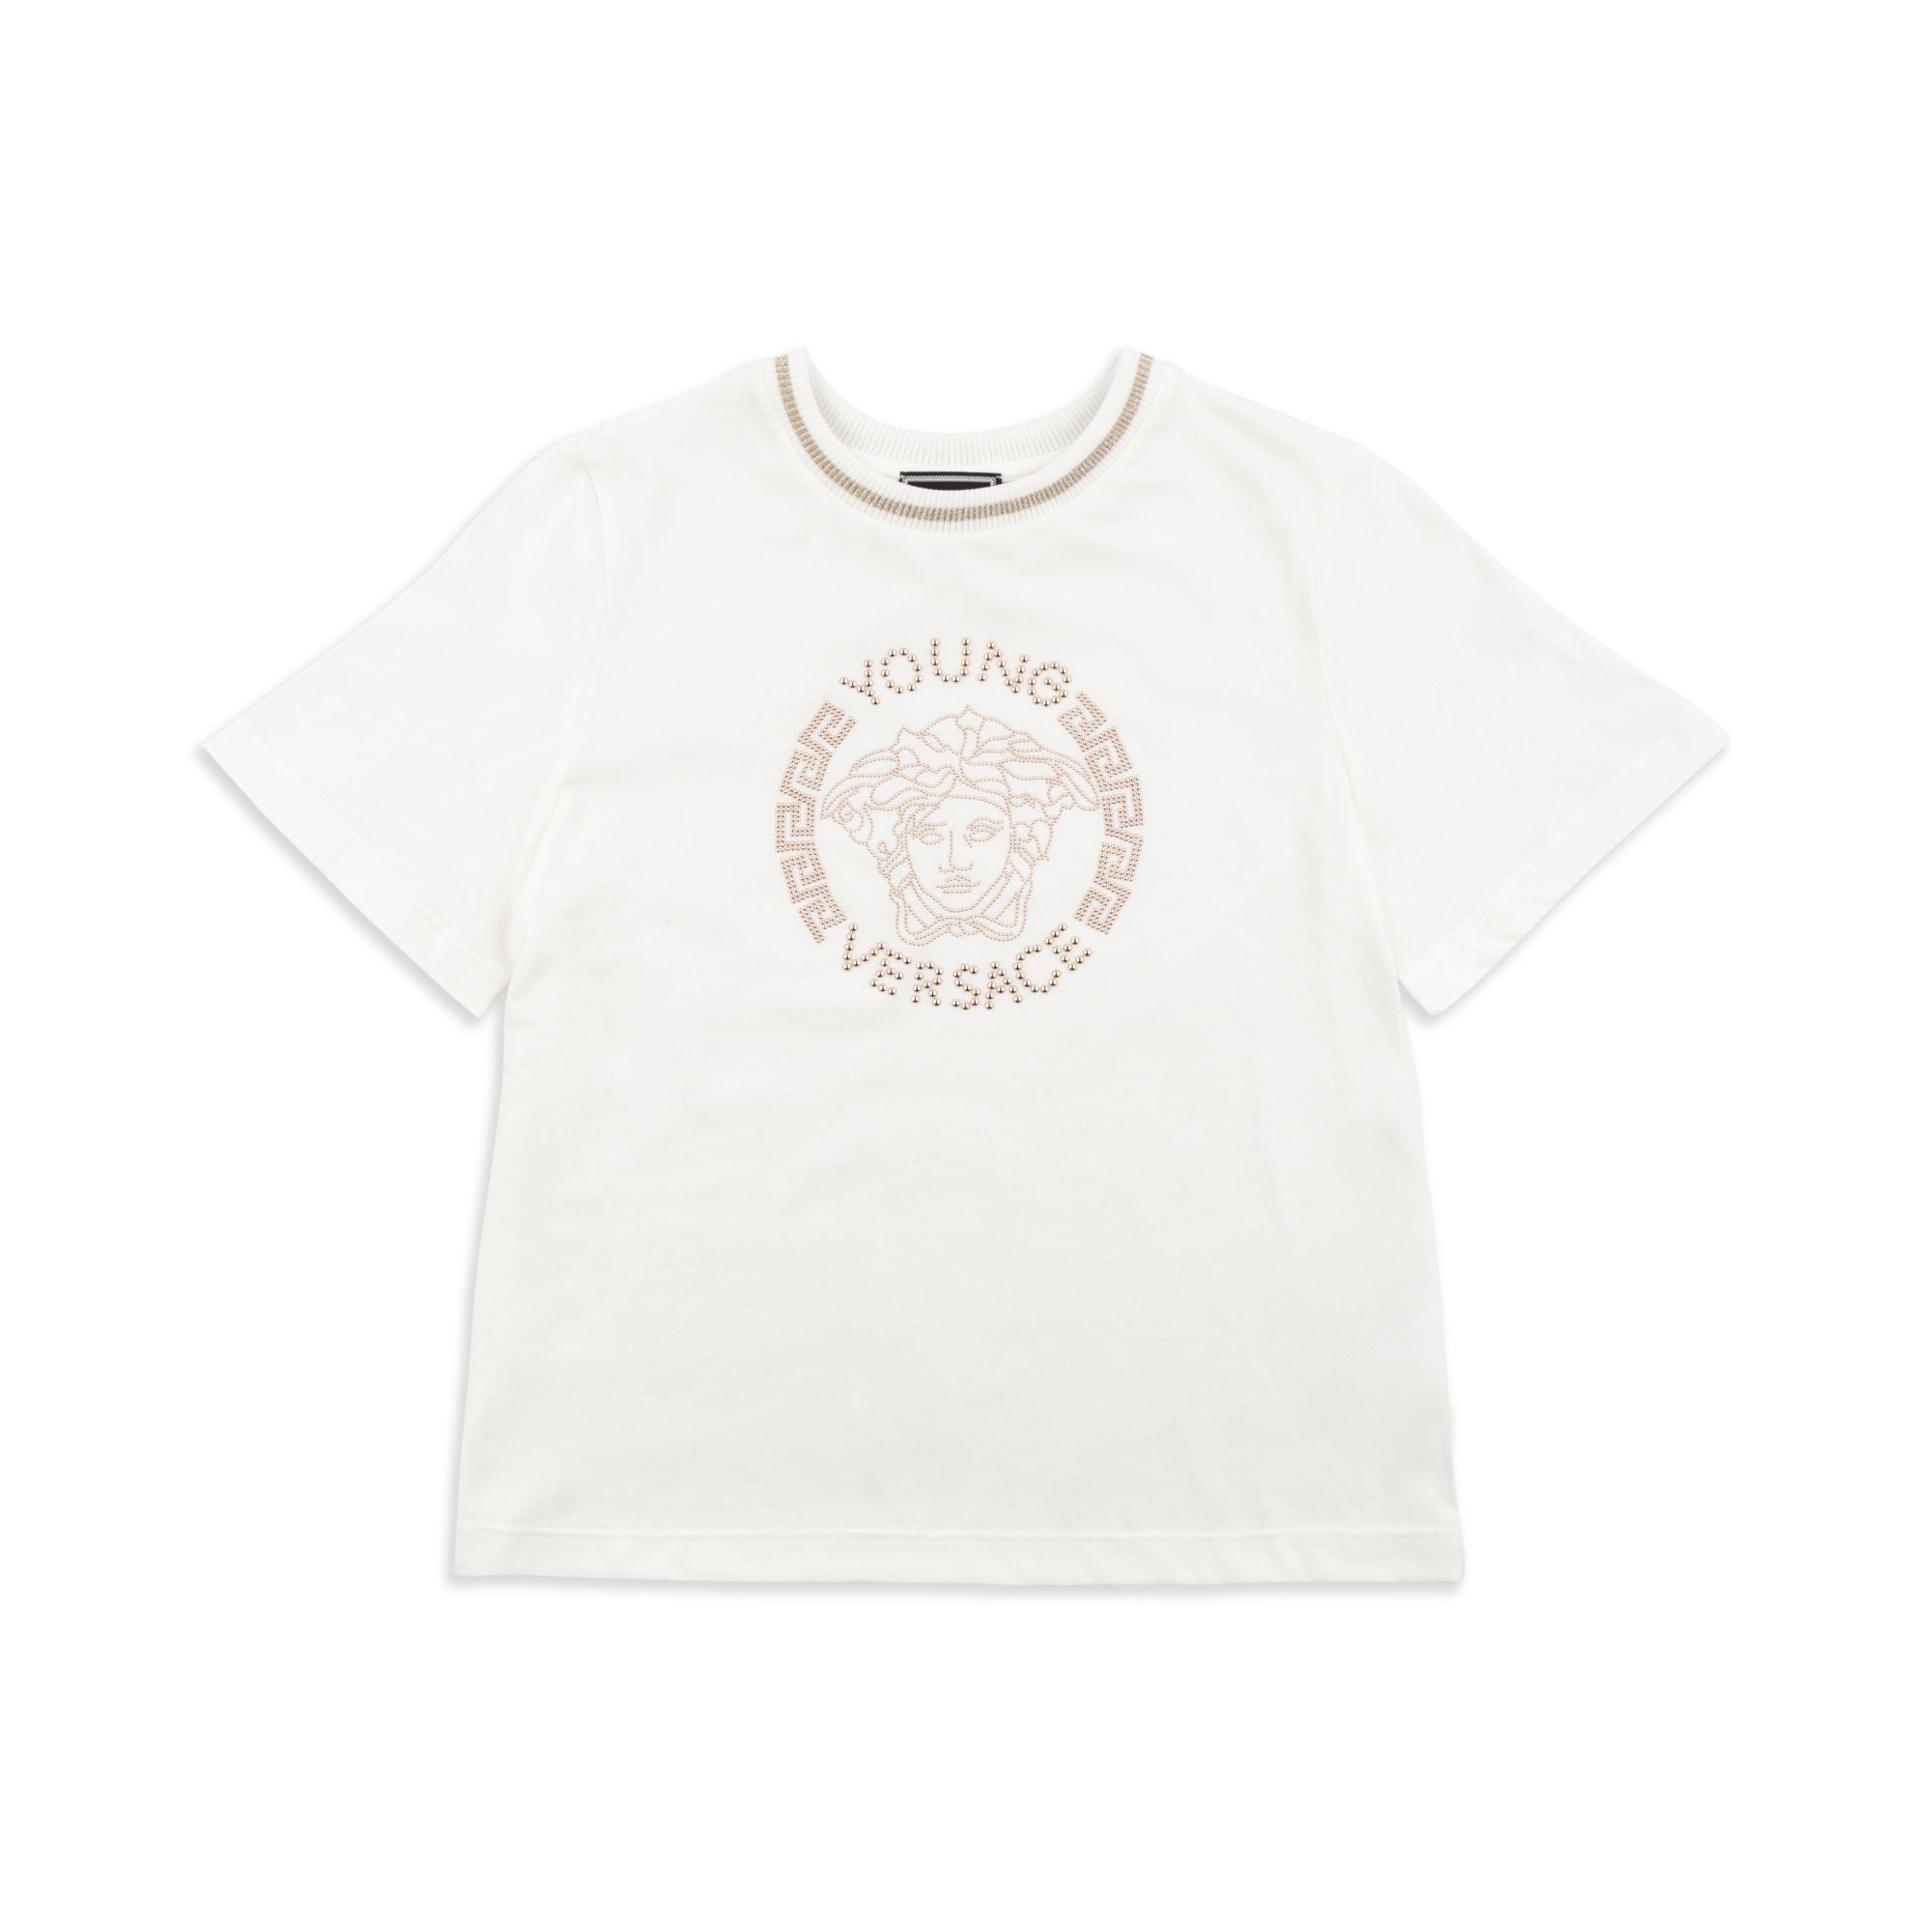 0f2e452b2887 YOUNG VERSACE Girls Cropped Medusa Head T-Shirt - White Girls short sleeve  t-shirt • Soft cotton jersey • Round neckline • Cropped design • Studded  Medusa ...